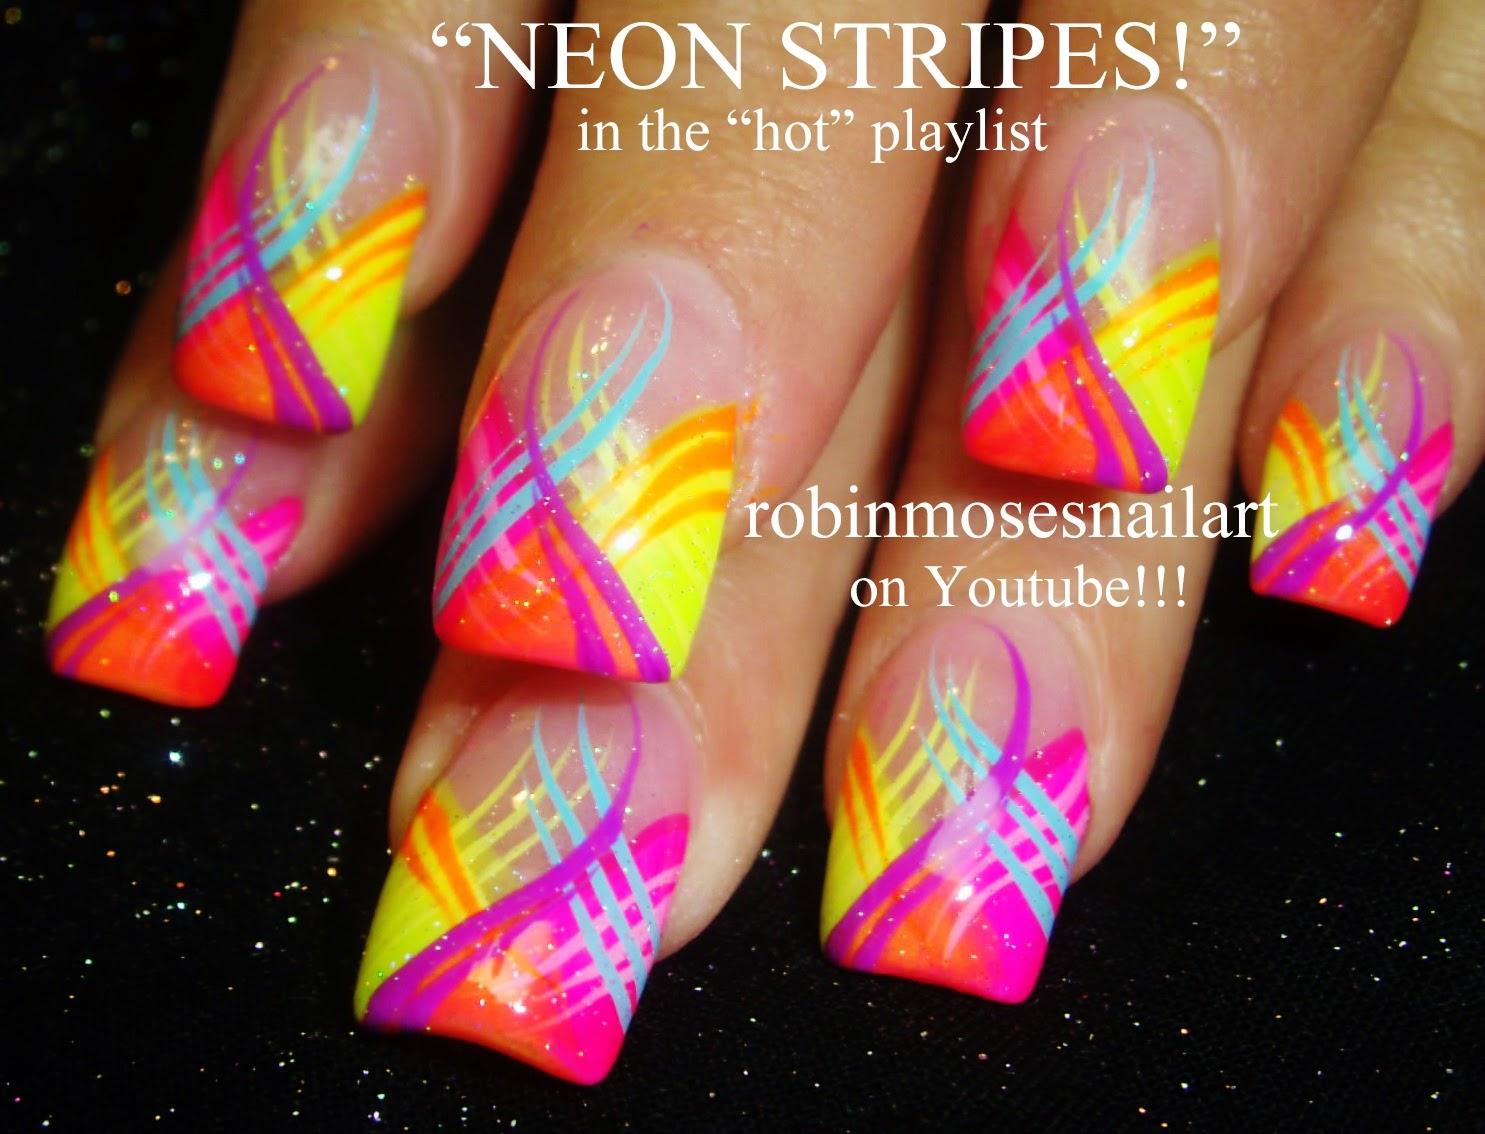 Robin moses nail art april 2015 hot nail art playlist easy nail art tutorials fierce nail design ideas for beginners to advanced nail techs prinsesfo Images